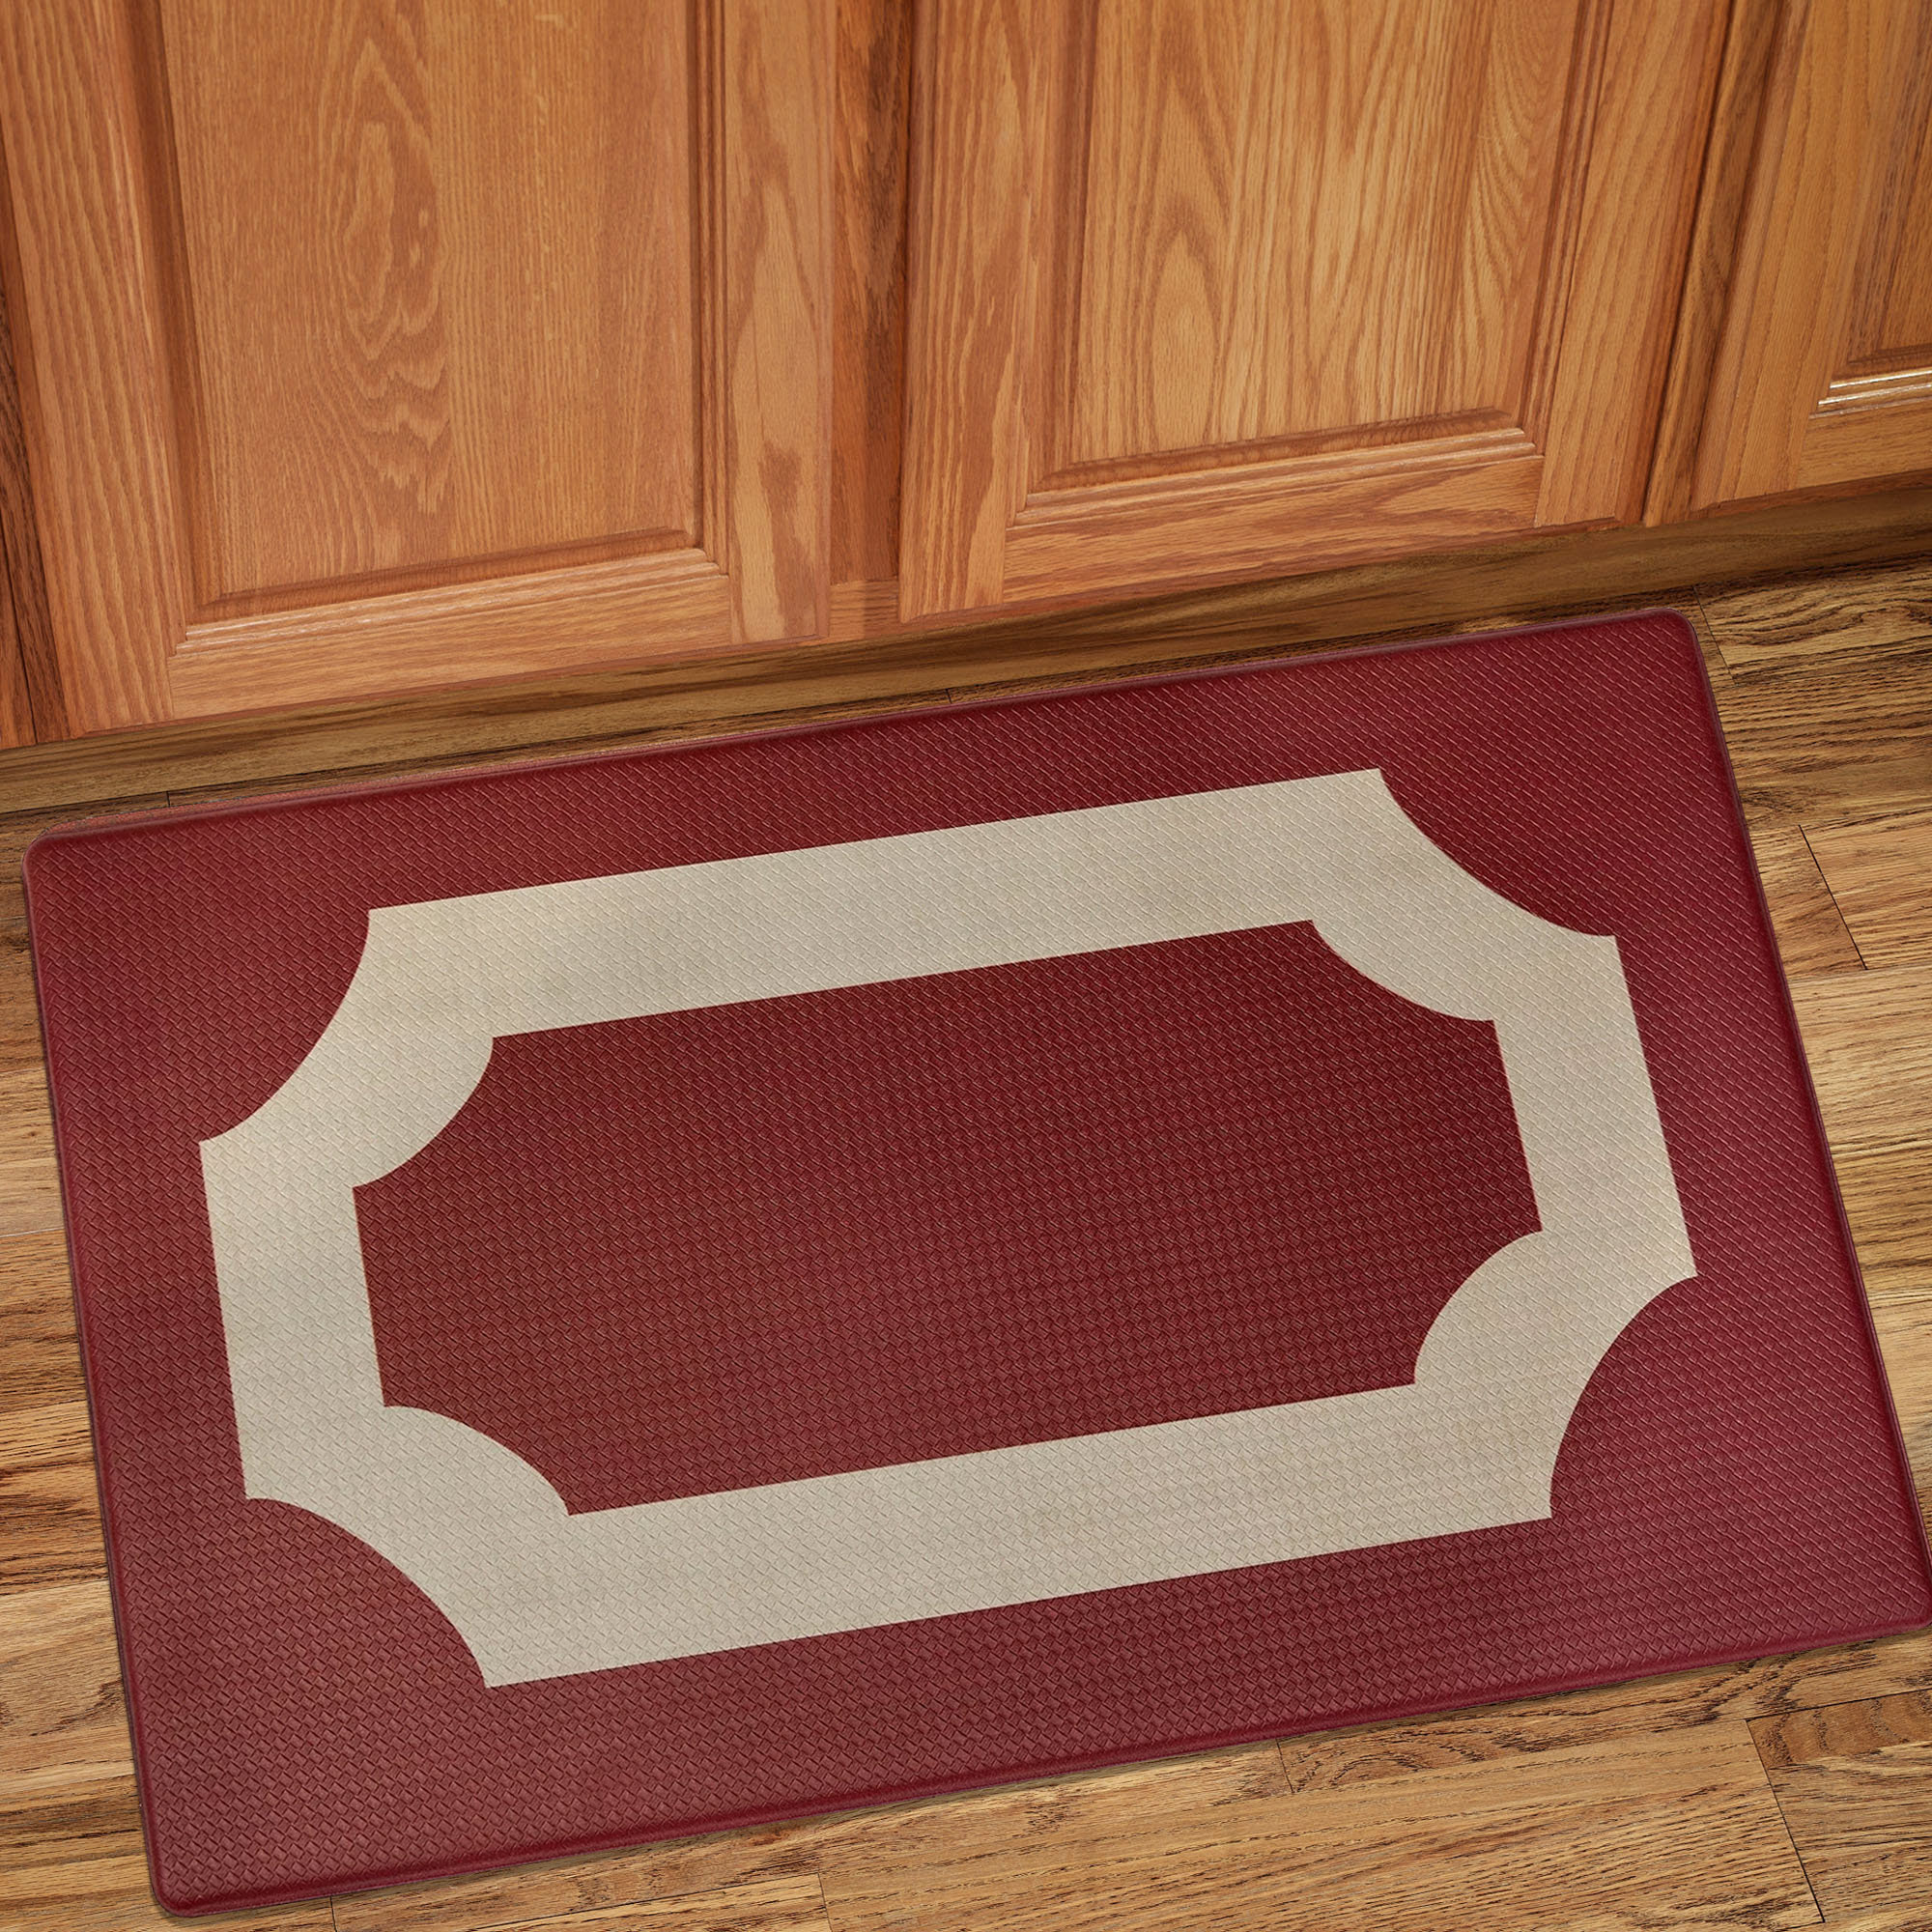 "Darcy Printed Anti-Fatigue Kitchen Floor Rug Mat 18"" x 30"" Marsala and Tan - Walmart.com"